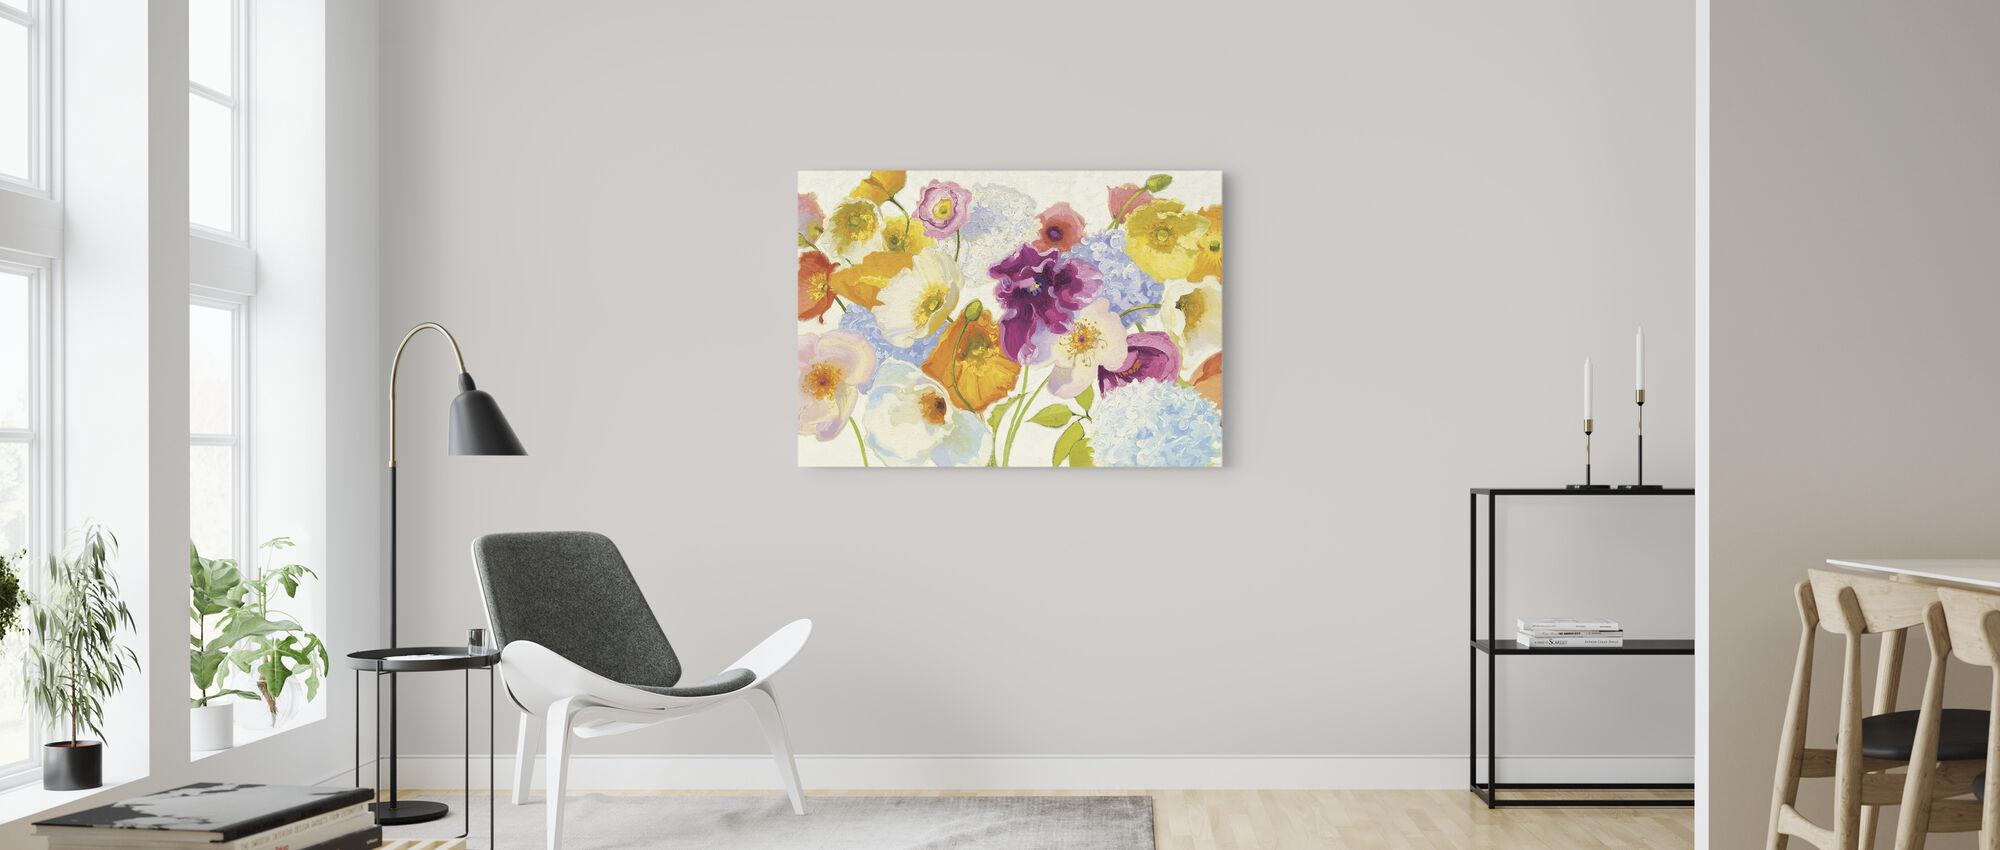 For Paris - Canvas print - Living Room